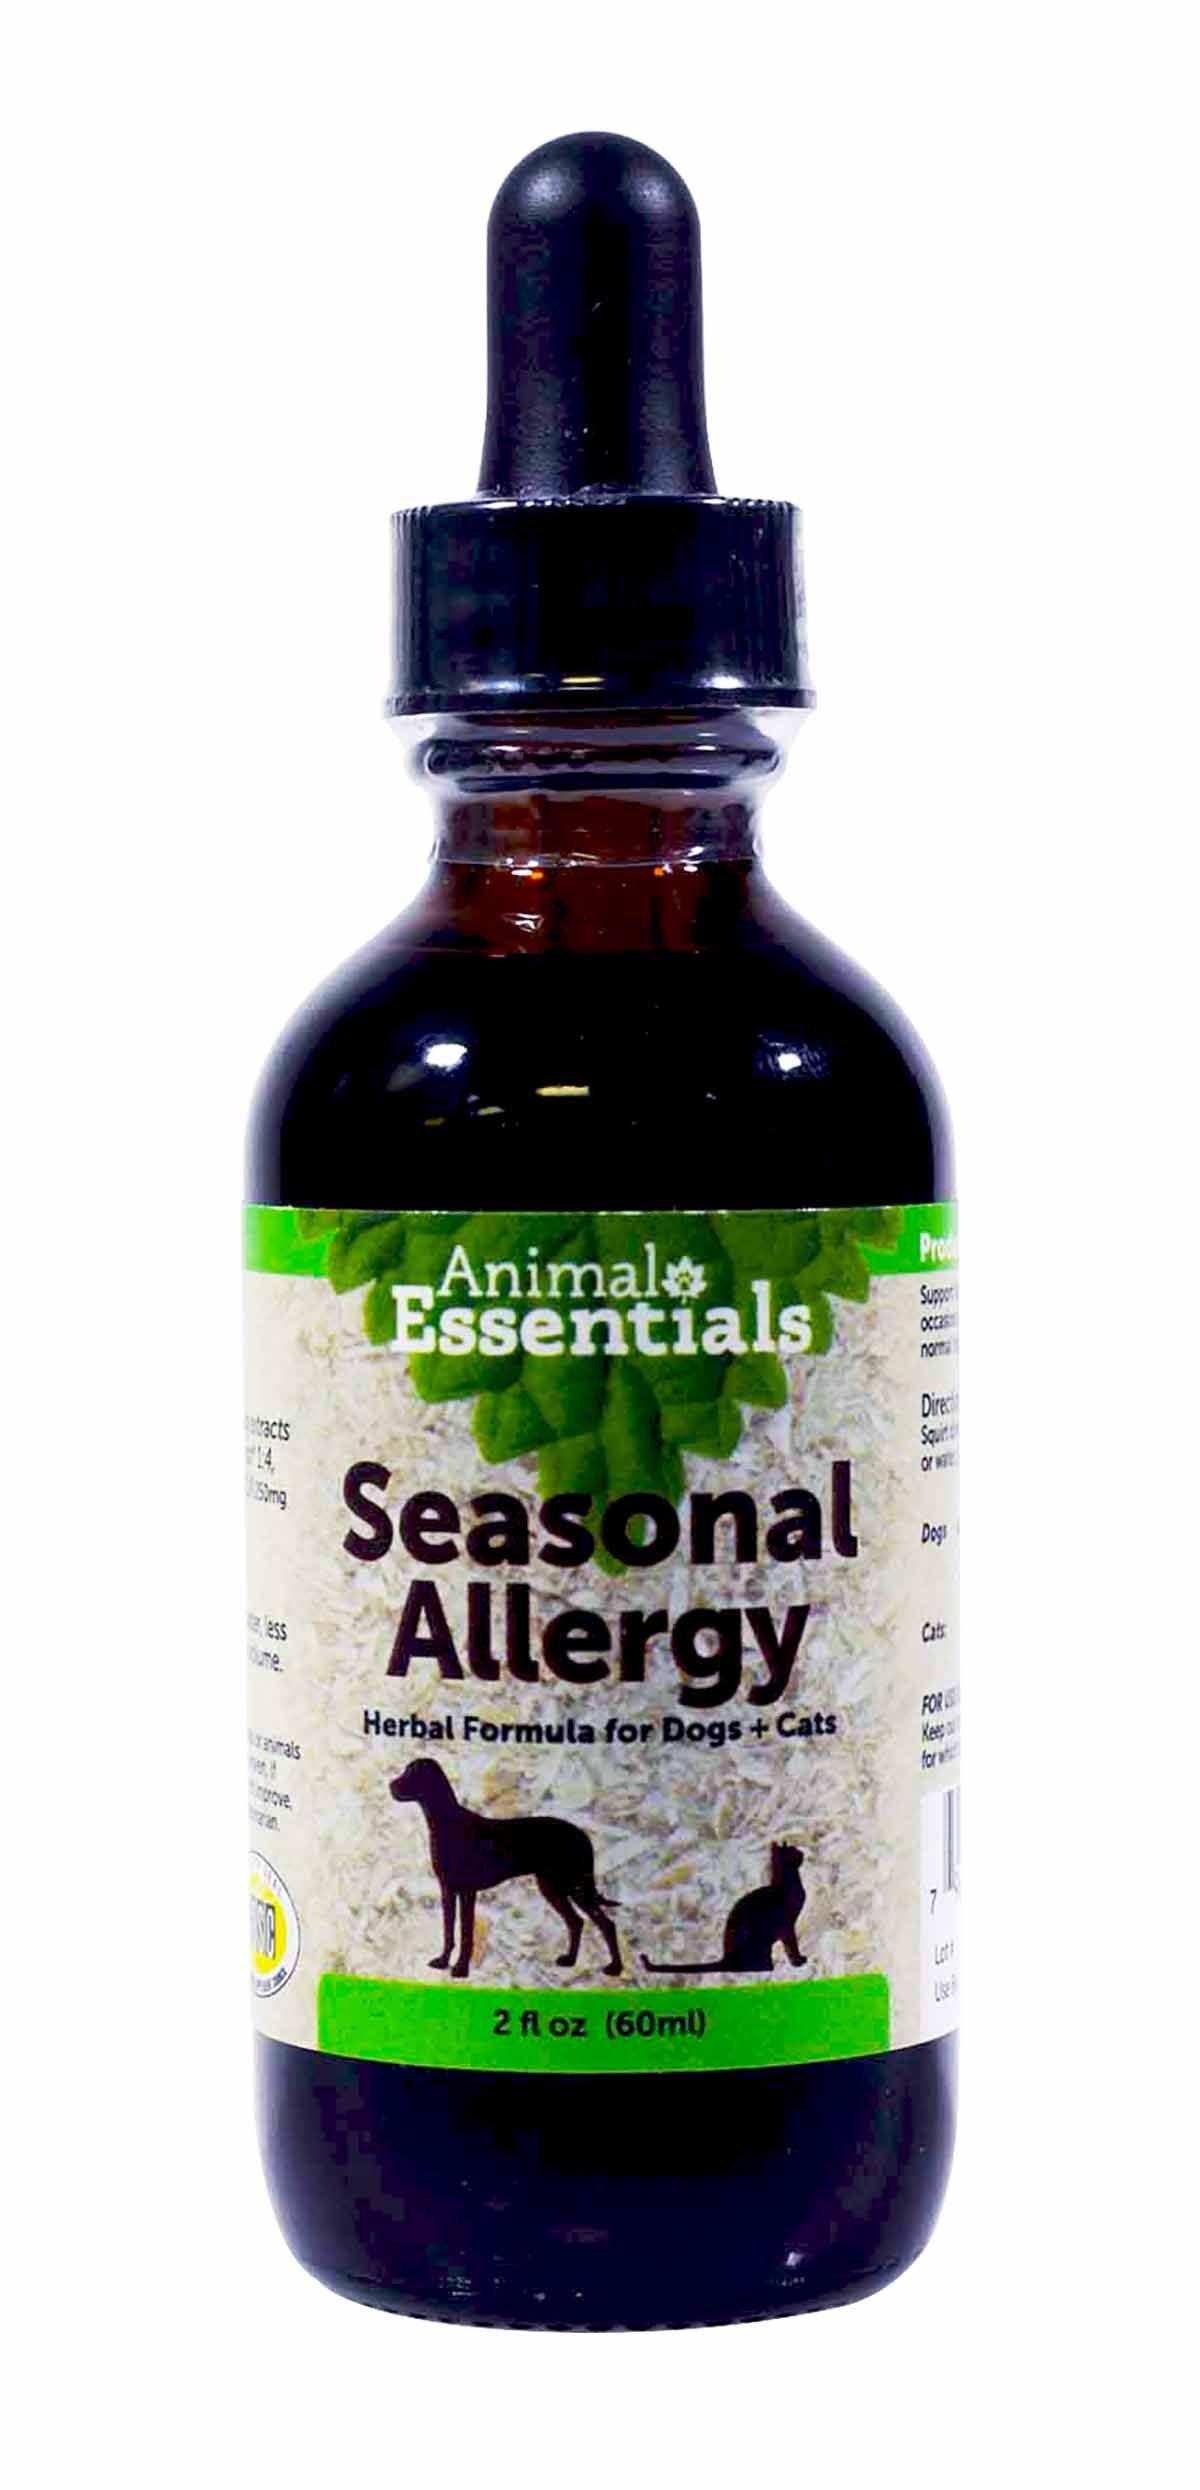 0ANIV Animal Essentials Seasonal Allergy Herbal Formula for Dogs + Cats 2 fl oz